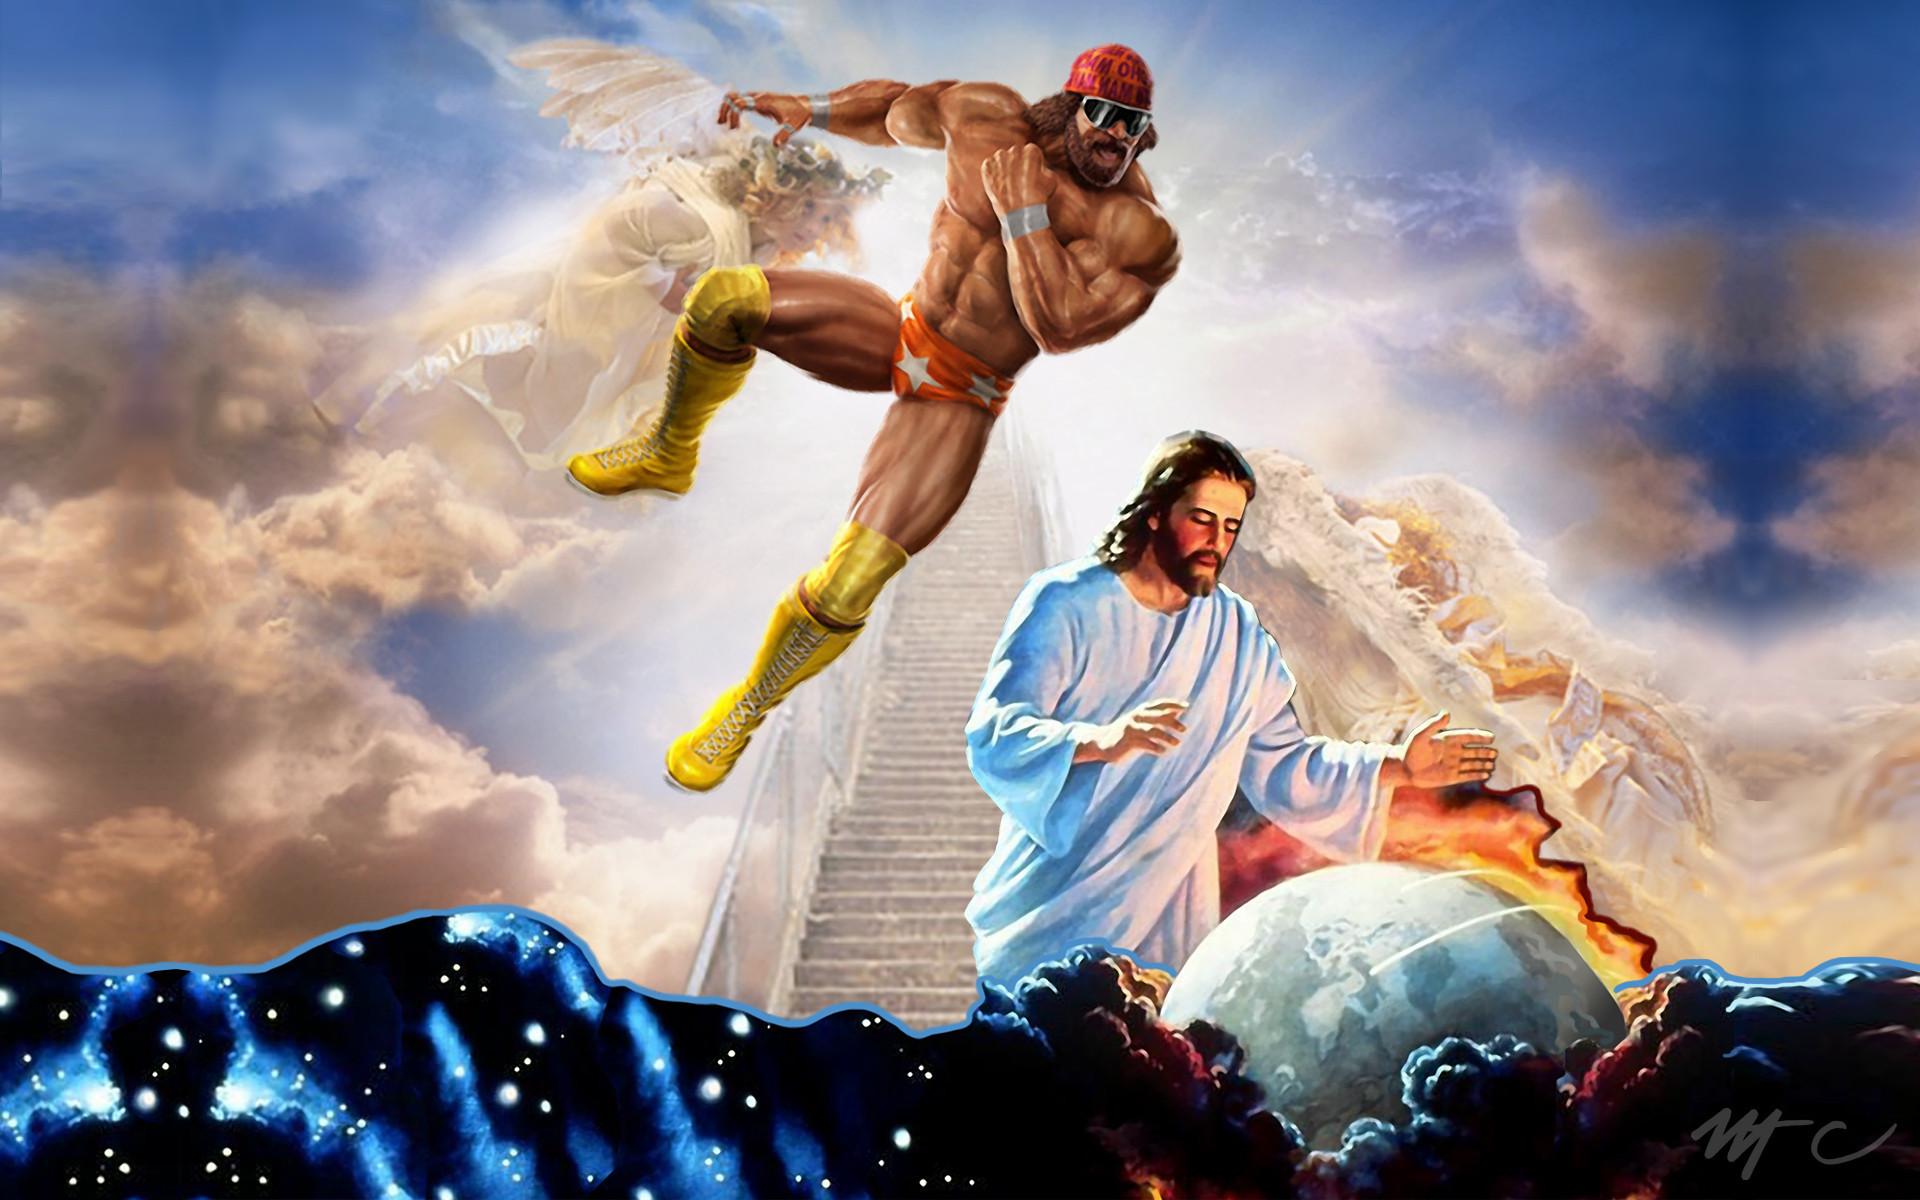 1920x1200 Macho Man Randy Savage Jesus Wallpaper 253728